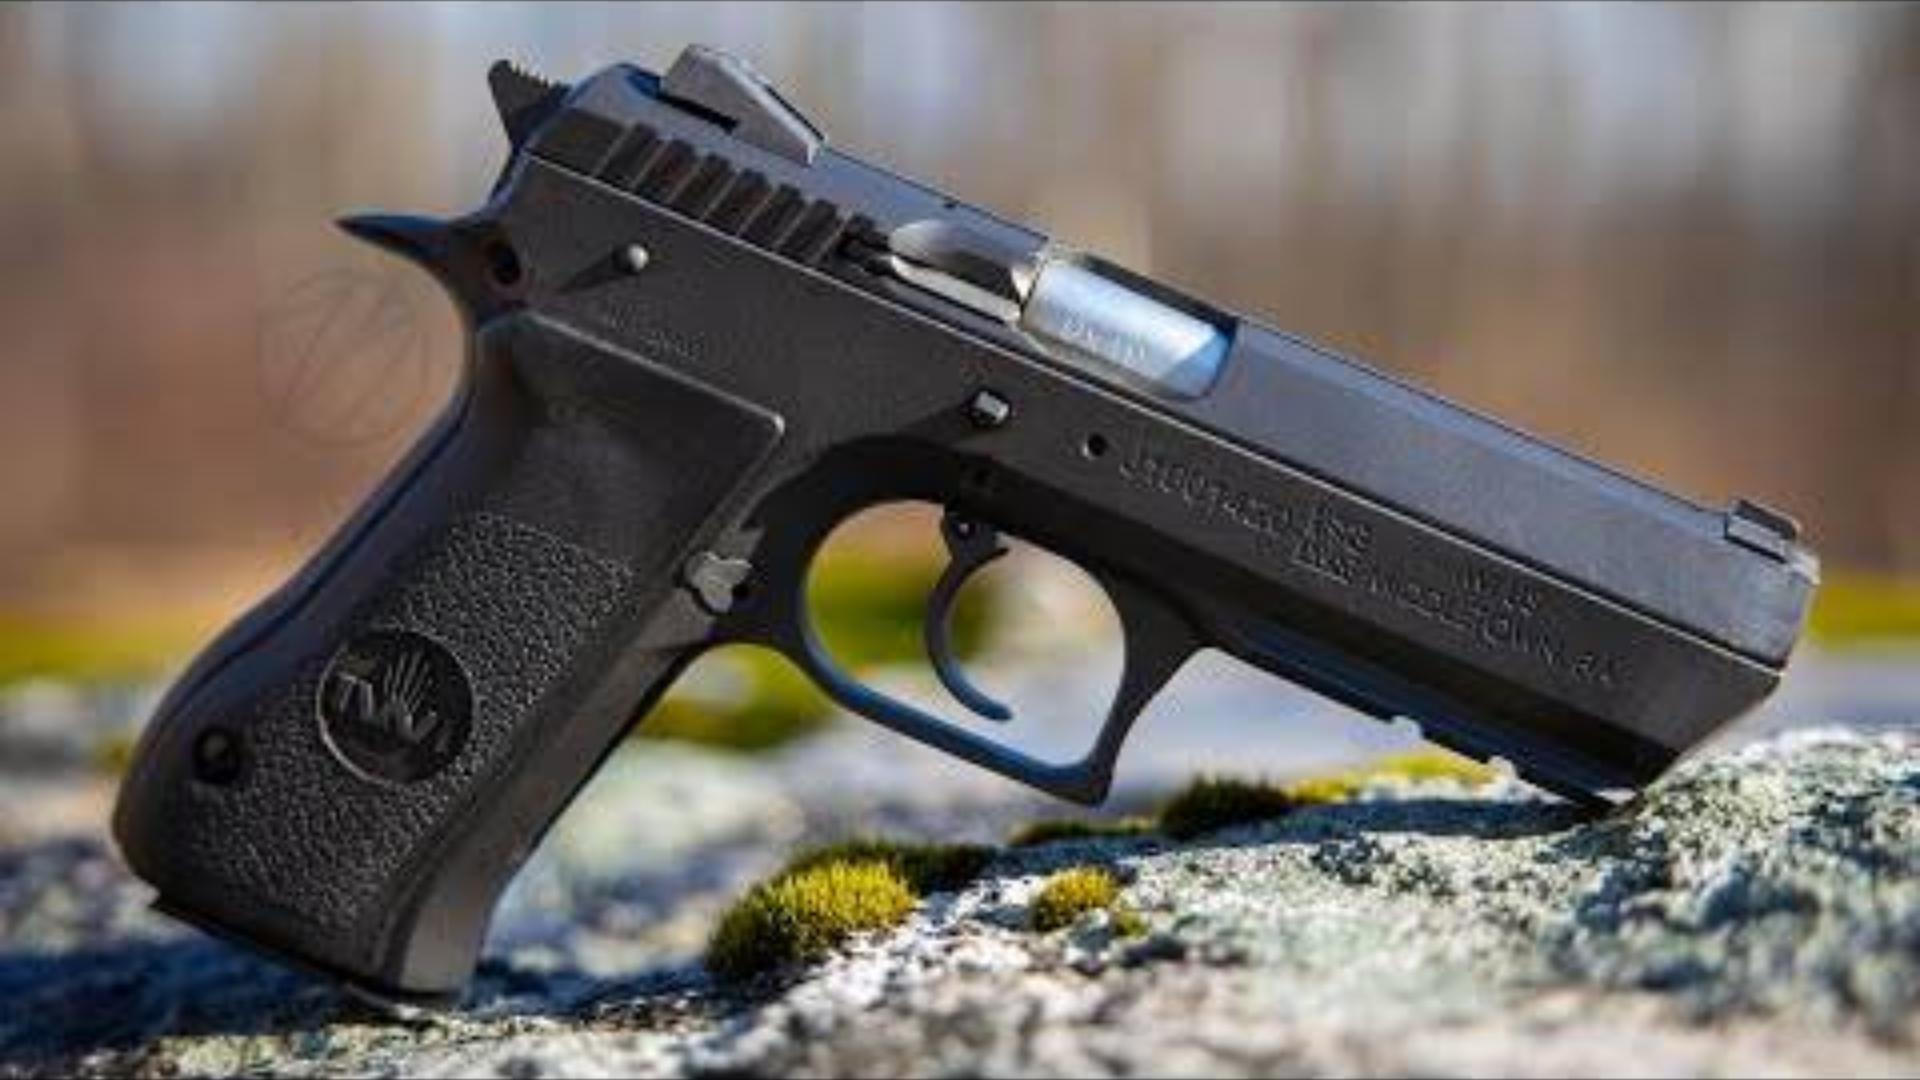 [Talonsei]杰里科941F9手枪